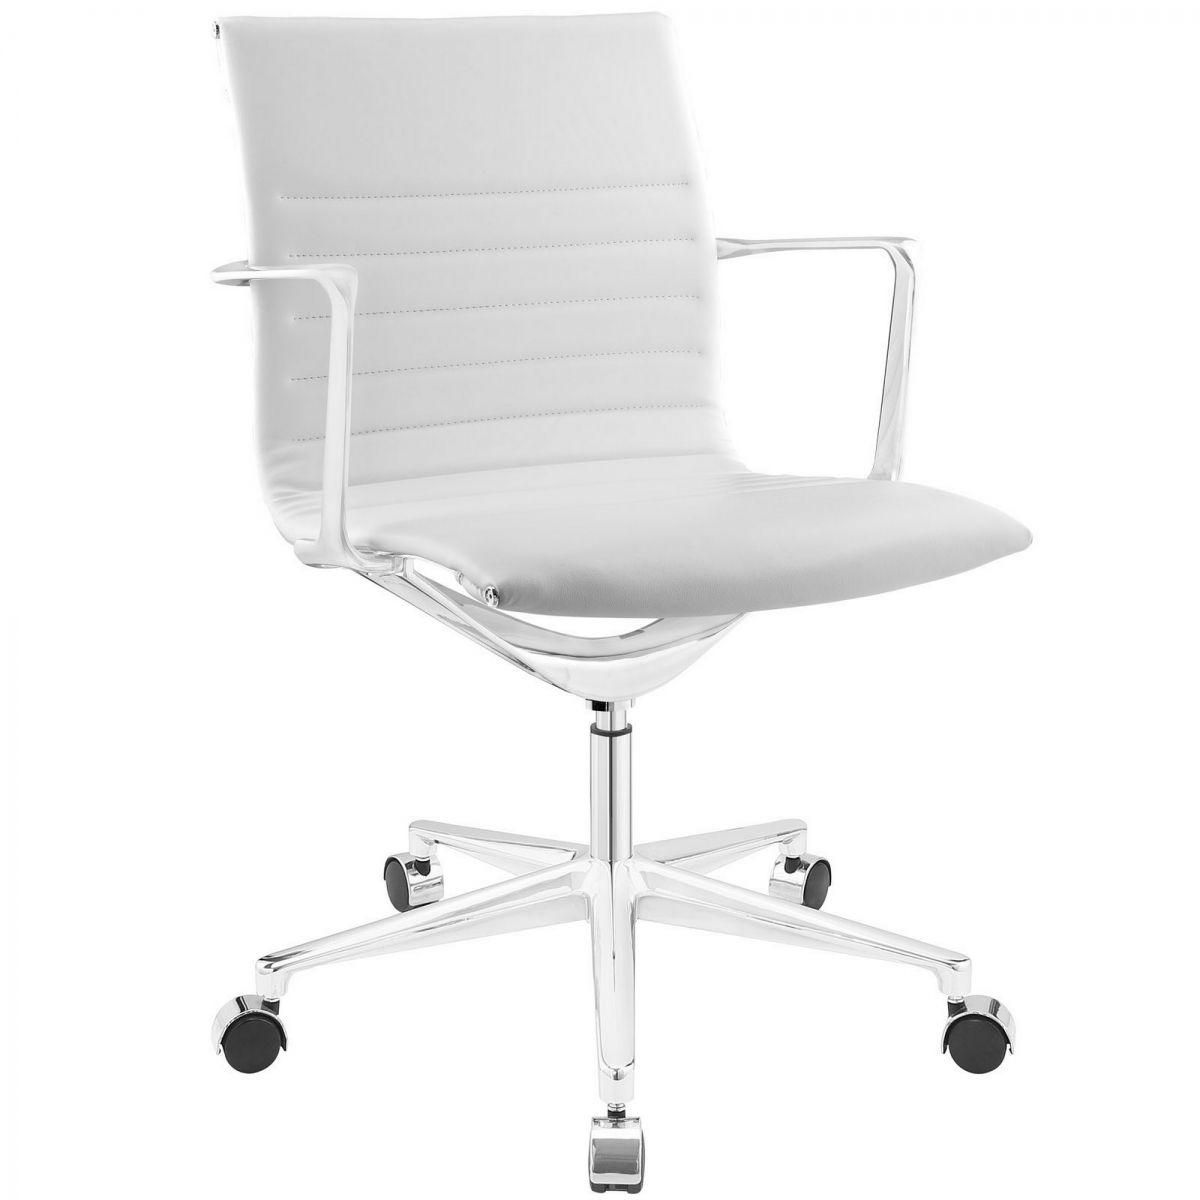 Vivian Mid Back Office Chair White Modern Office Chair Office Chair Mid Century Modern Office Chair